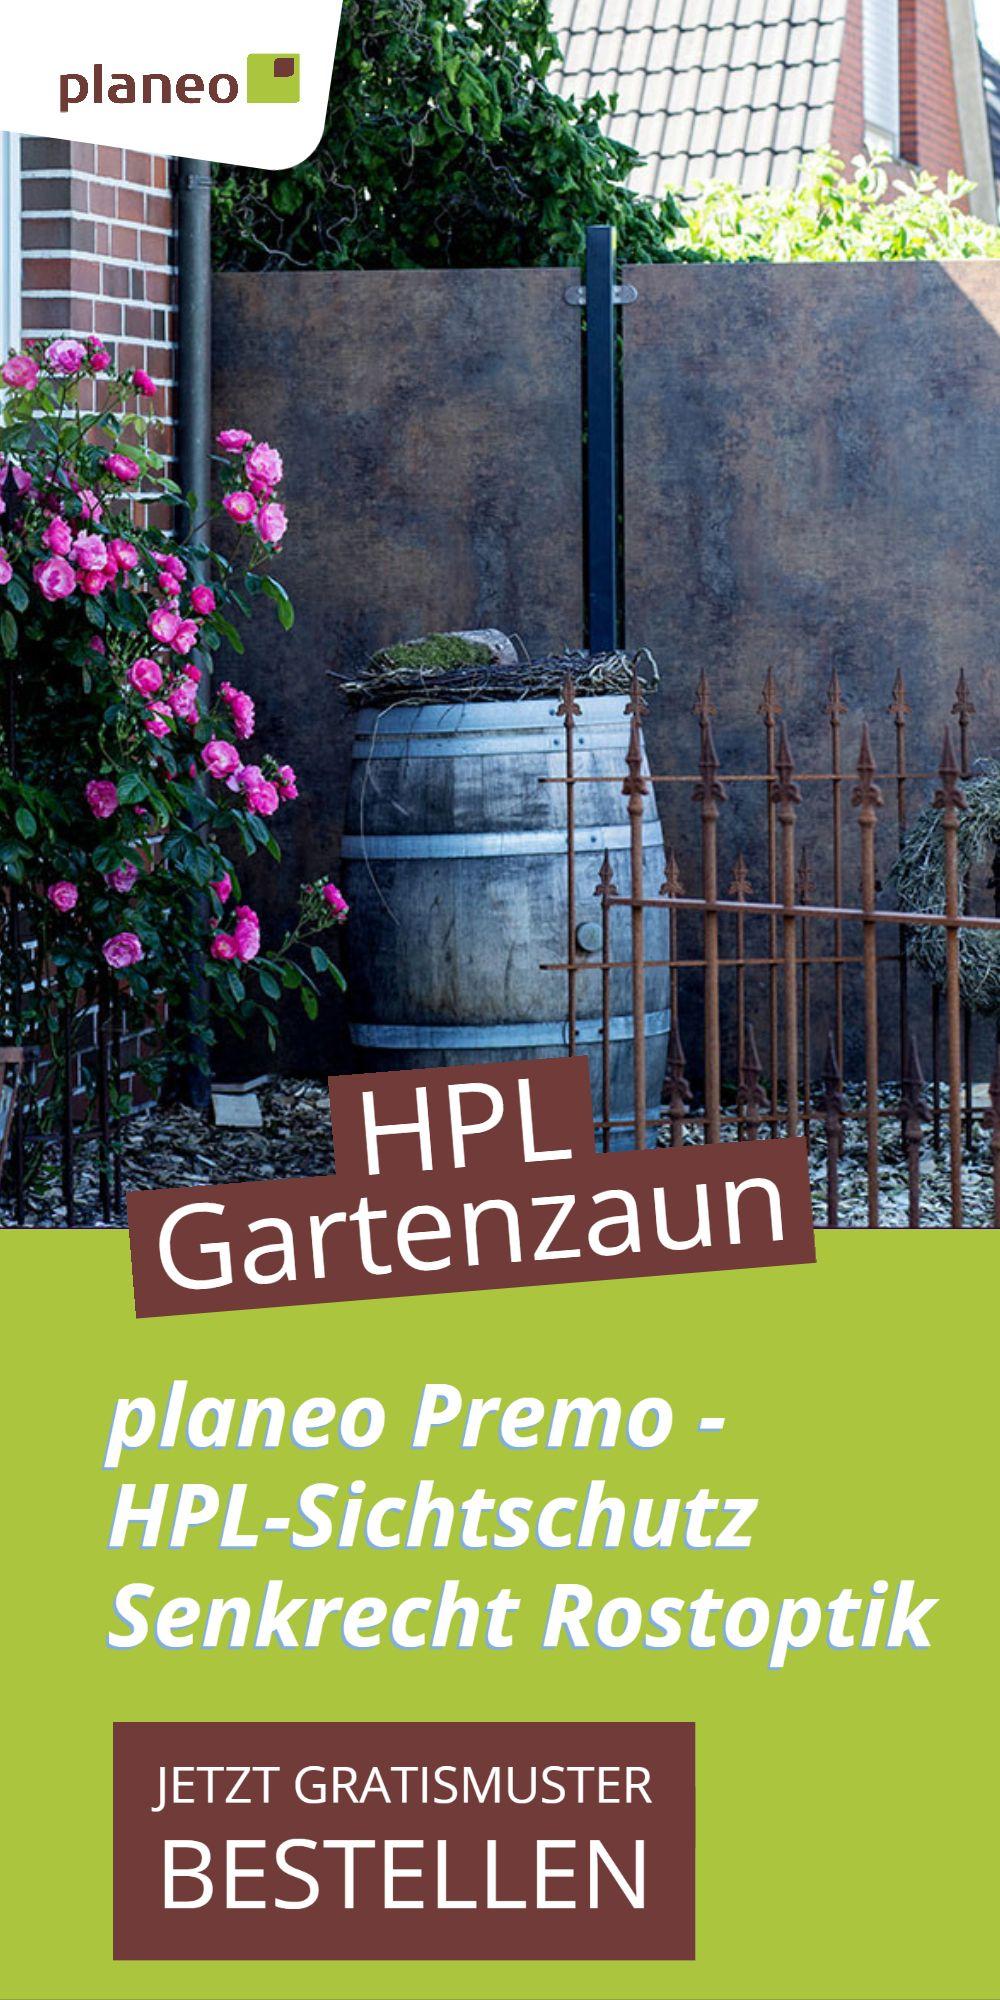 Planeo Premo Gartenzaun Hpl Sichtschutz Senkrecht Rostoptik